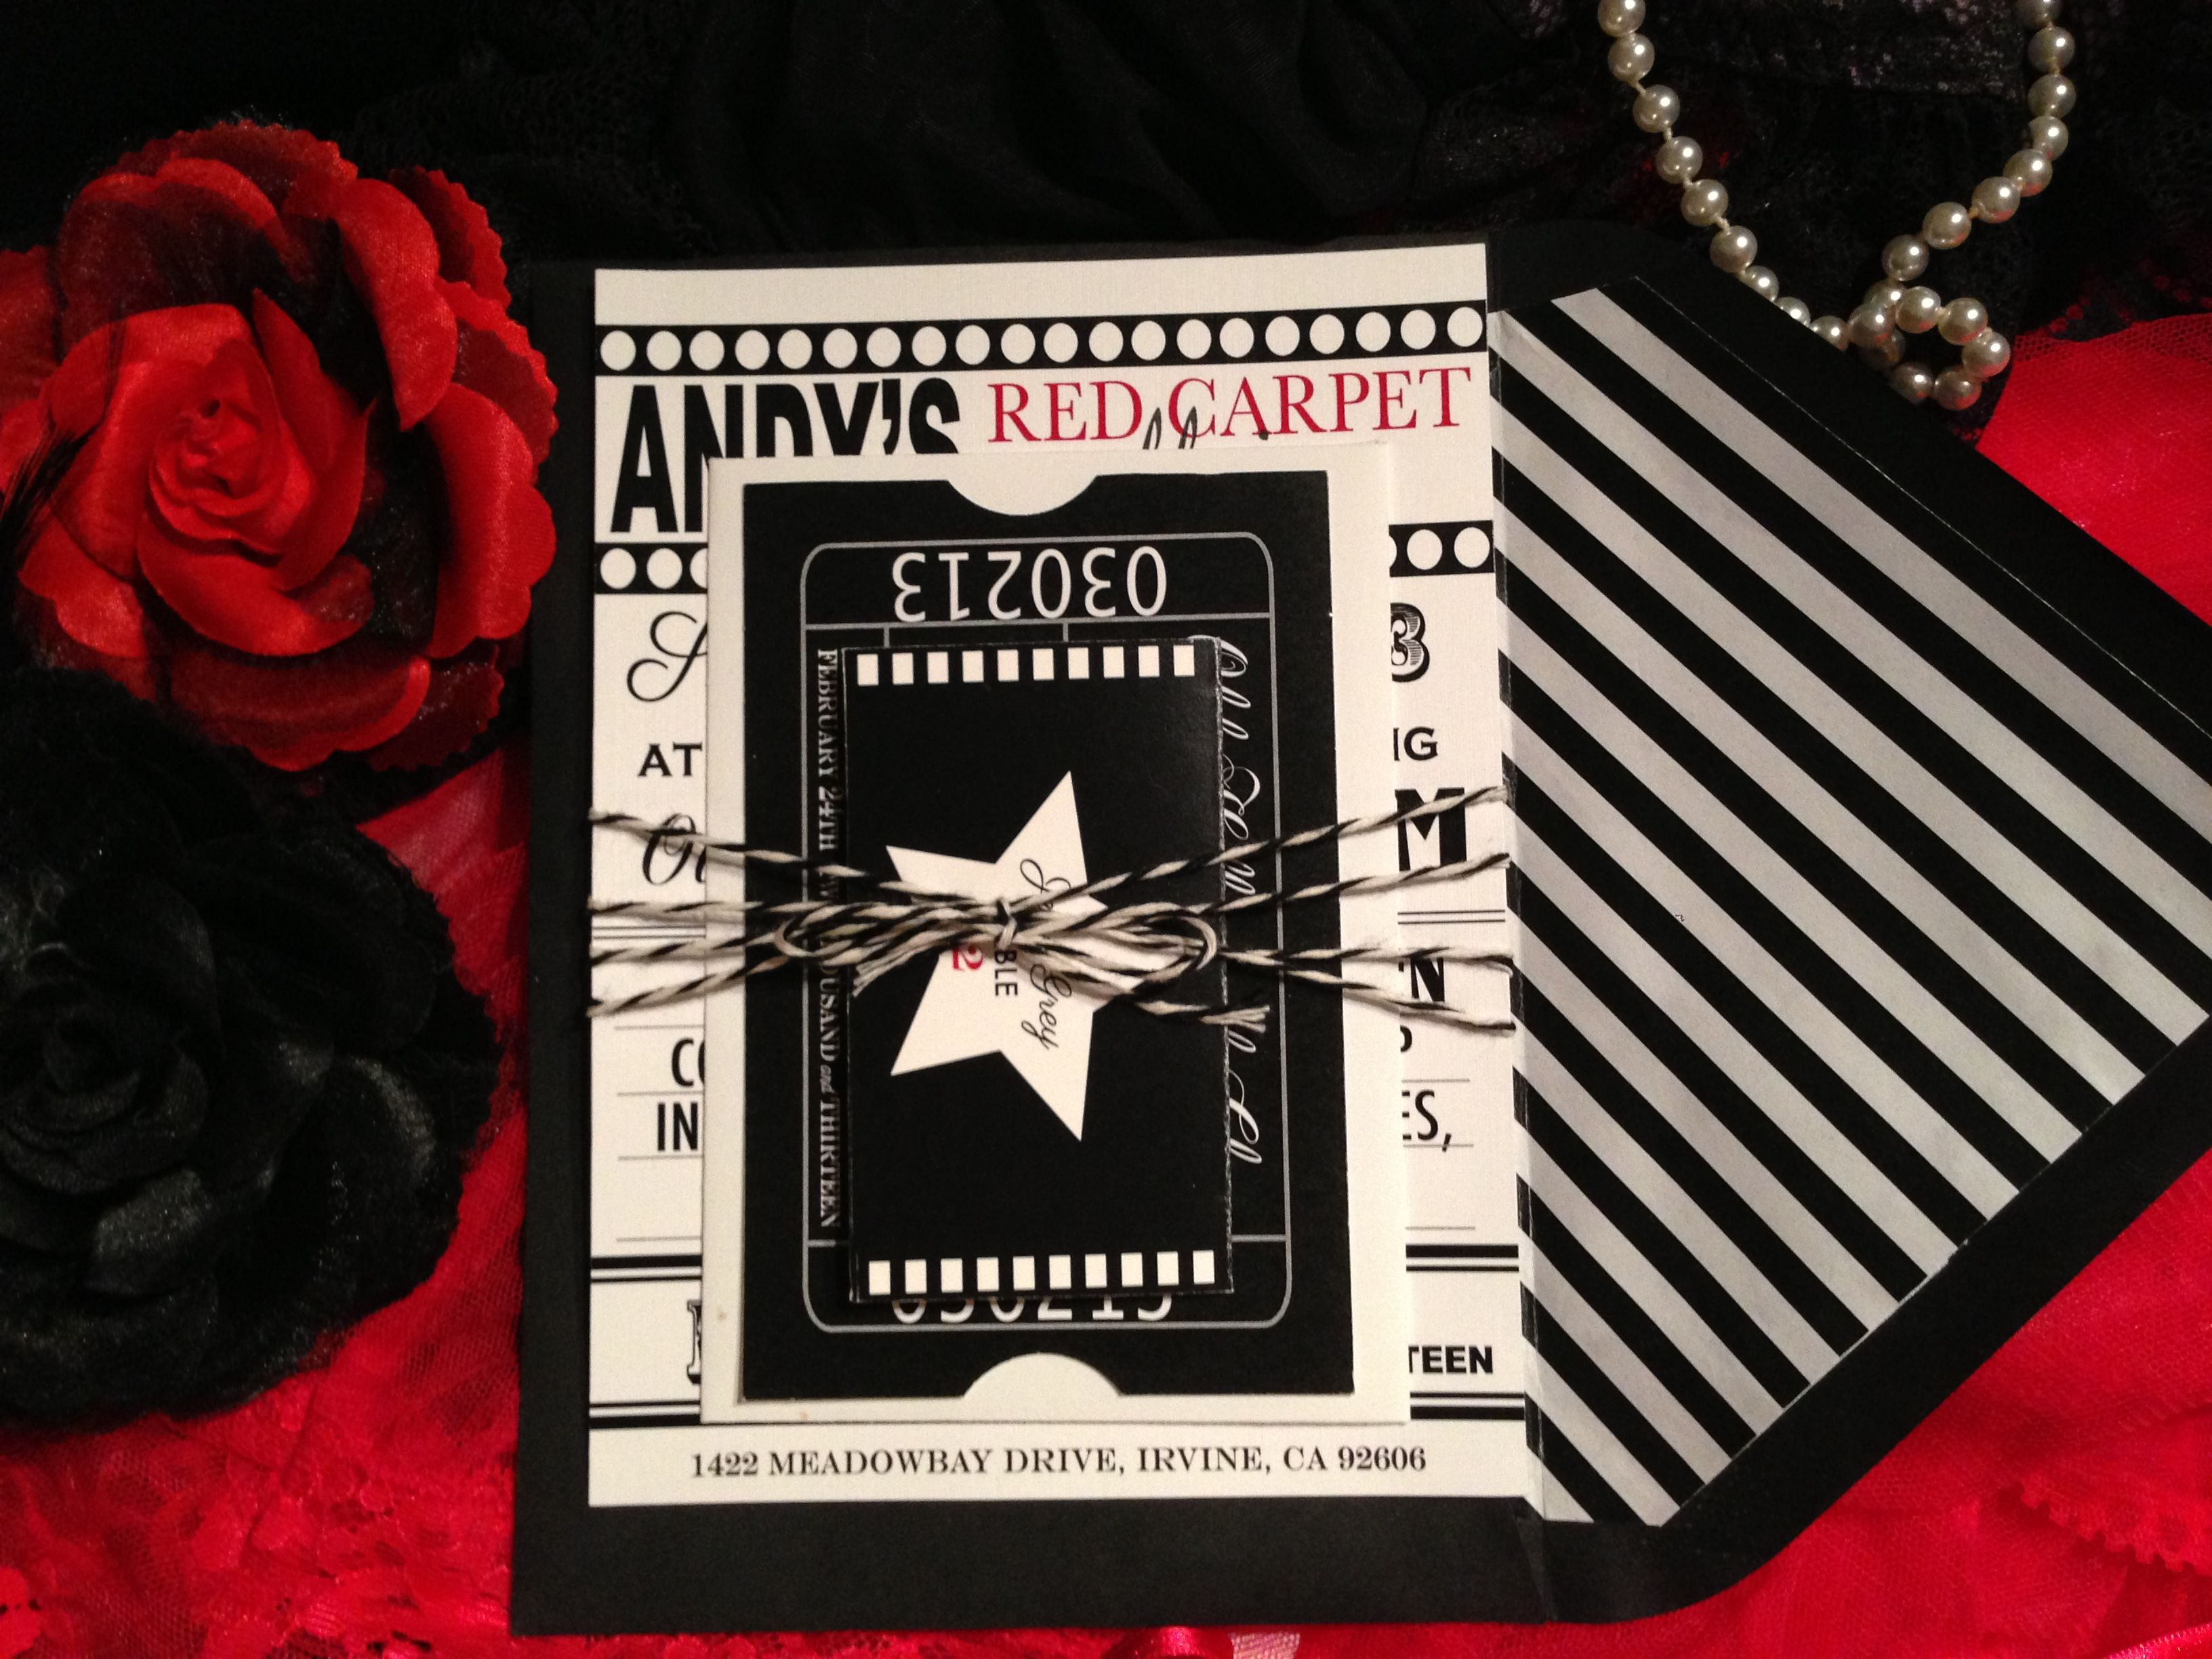 hollywood themed invitation | Invitations | Pinterest | Red carpet ...